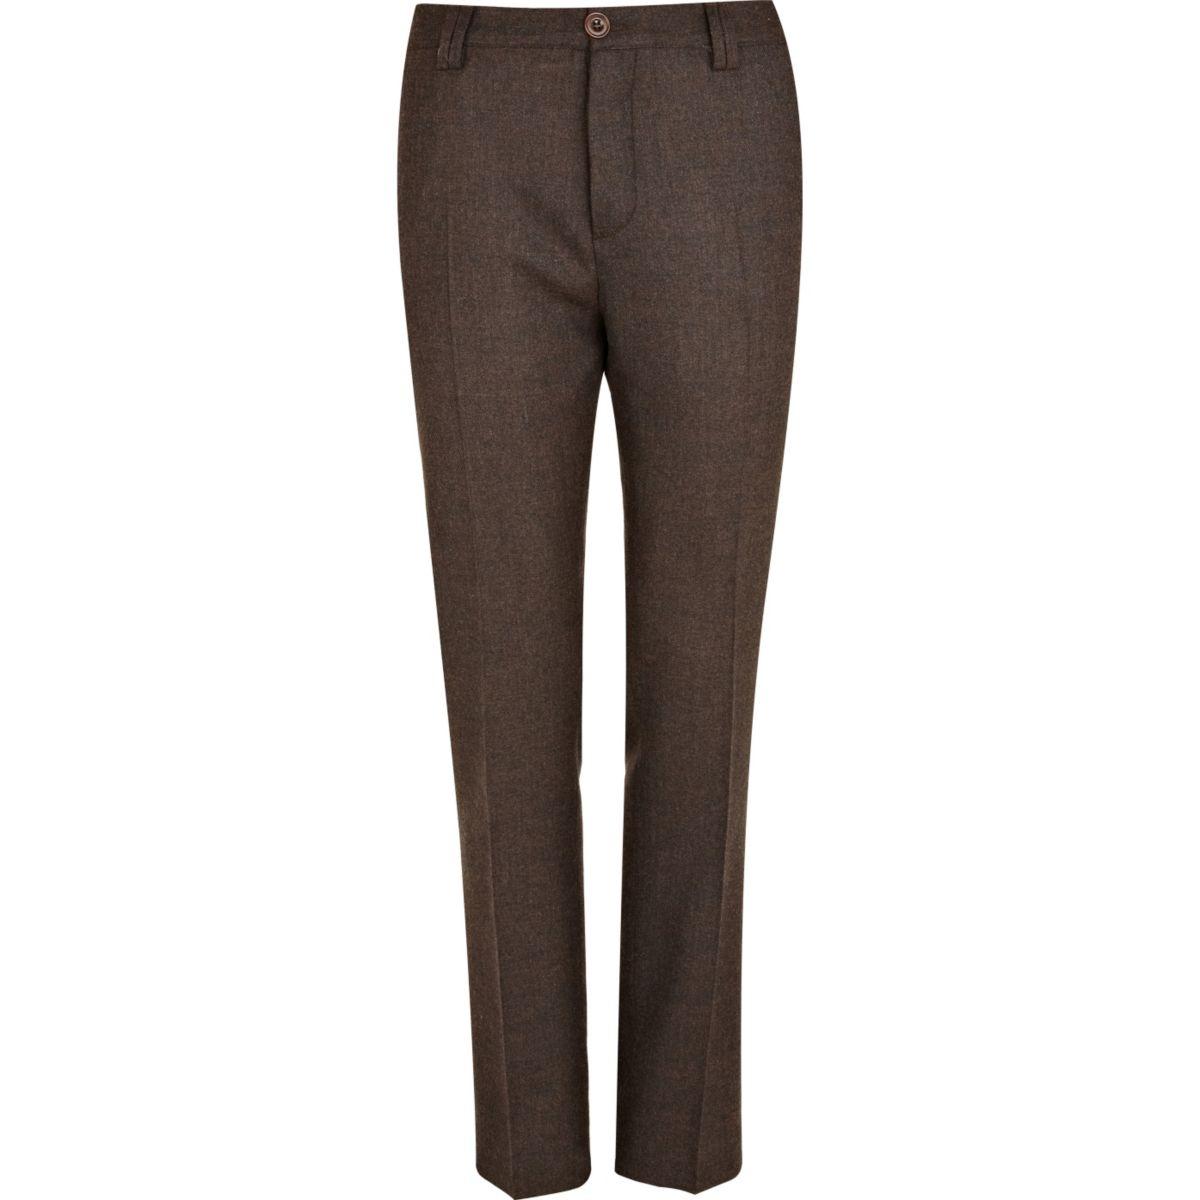 Brown Holloway Road suit pants